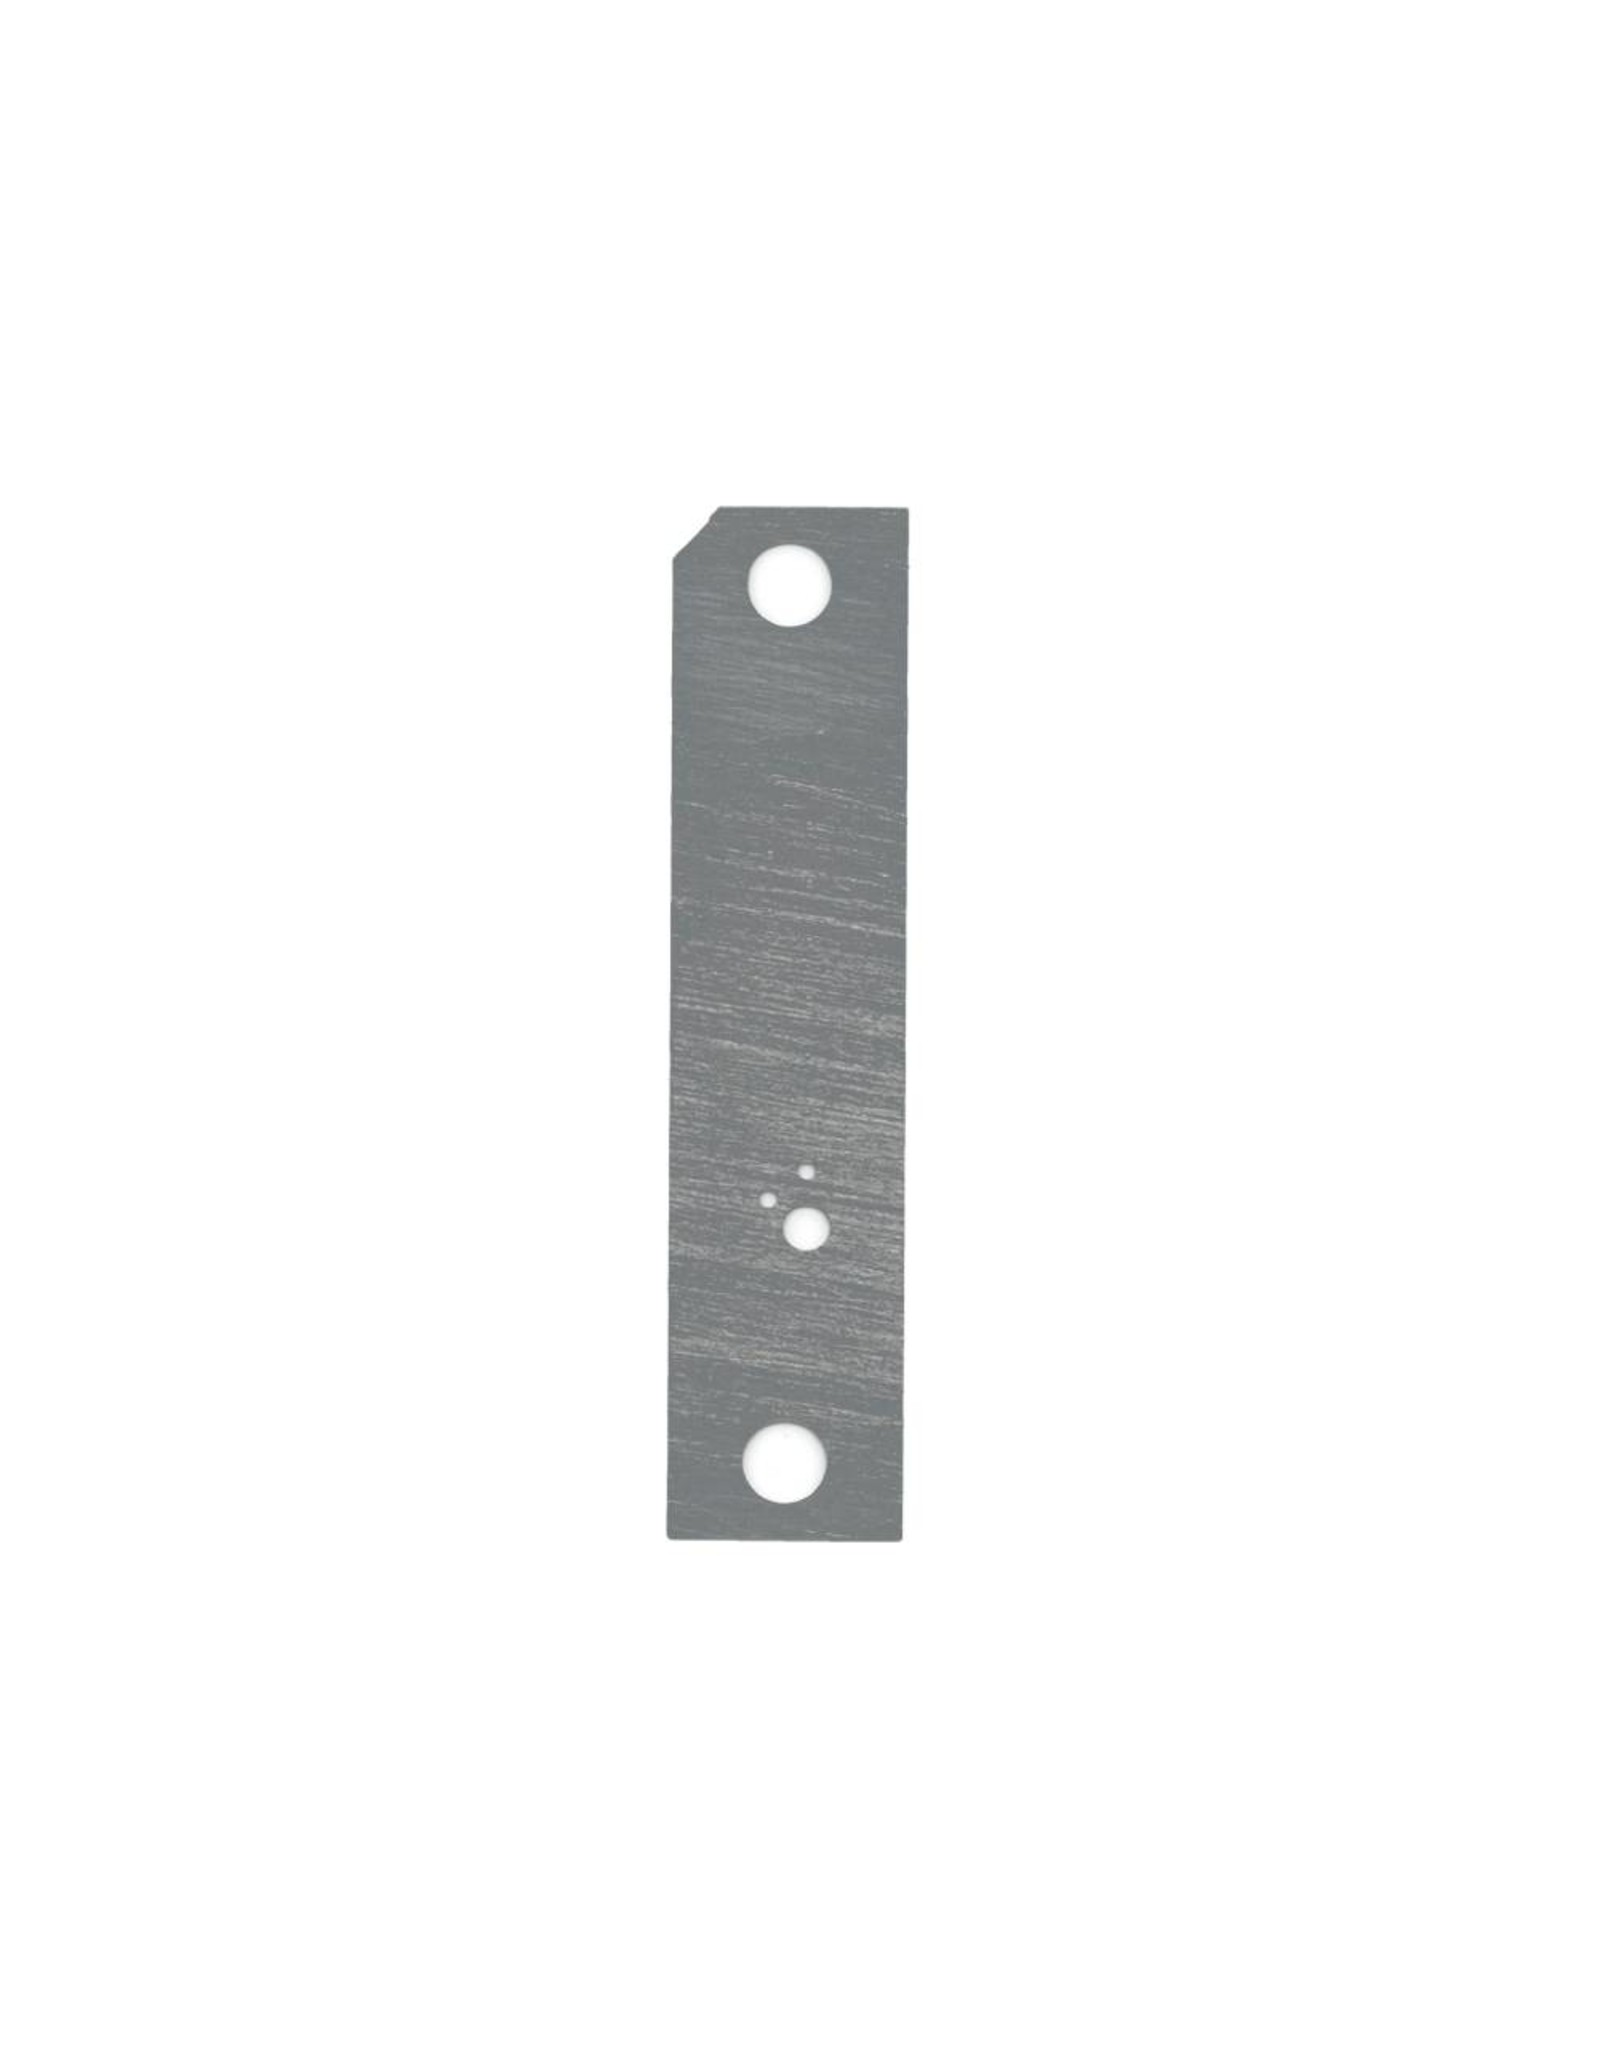 Aperture Strip for FEI Sidewinder / Tomahawk G3 FIB